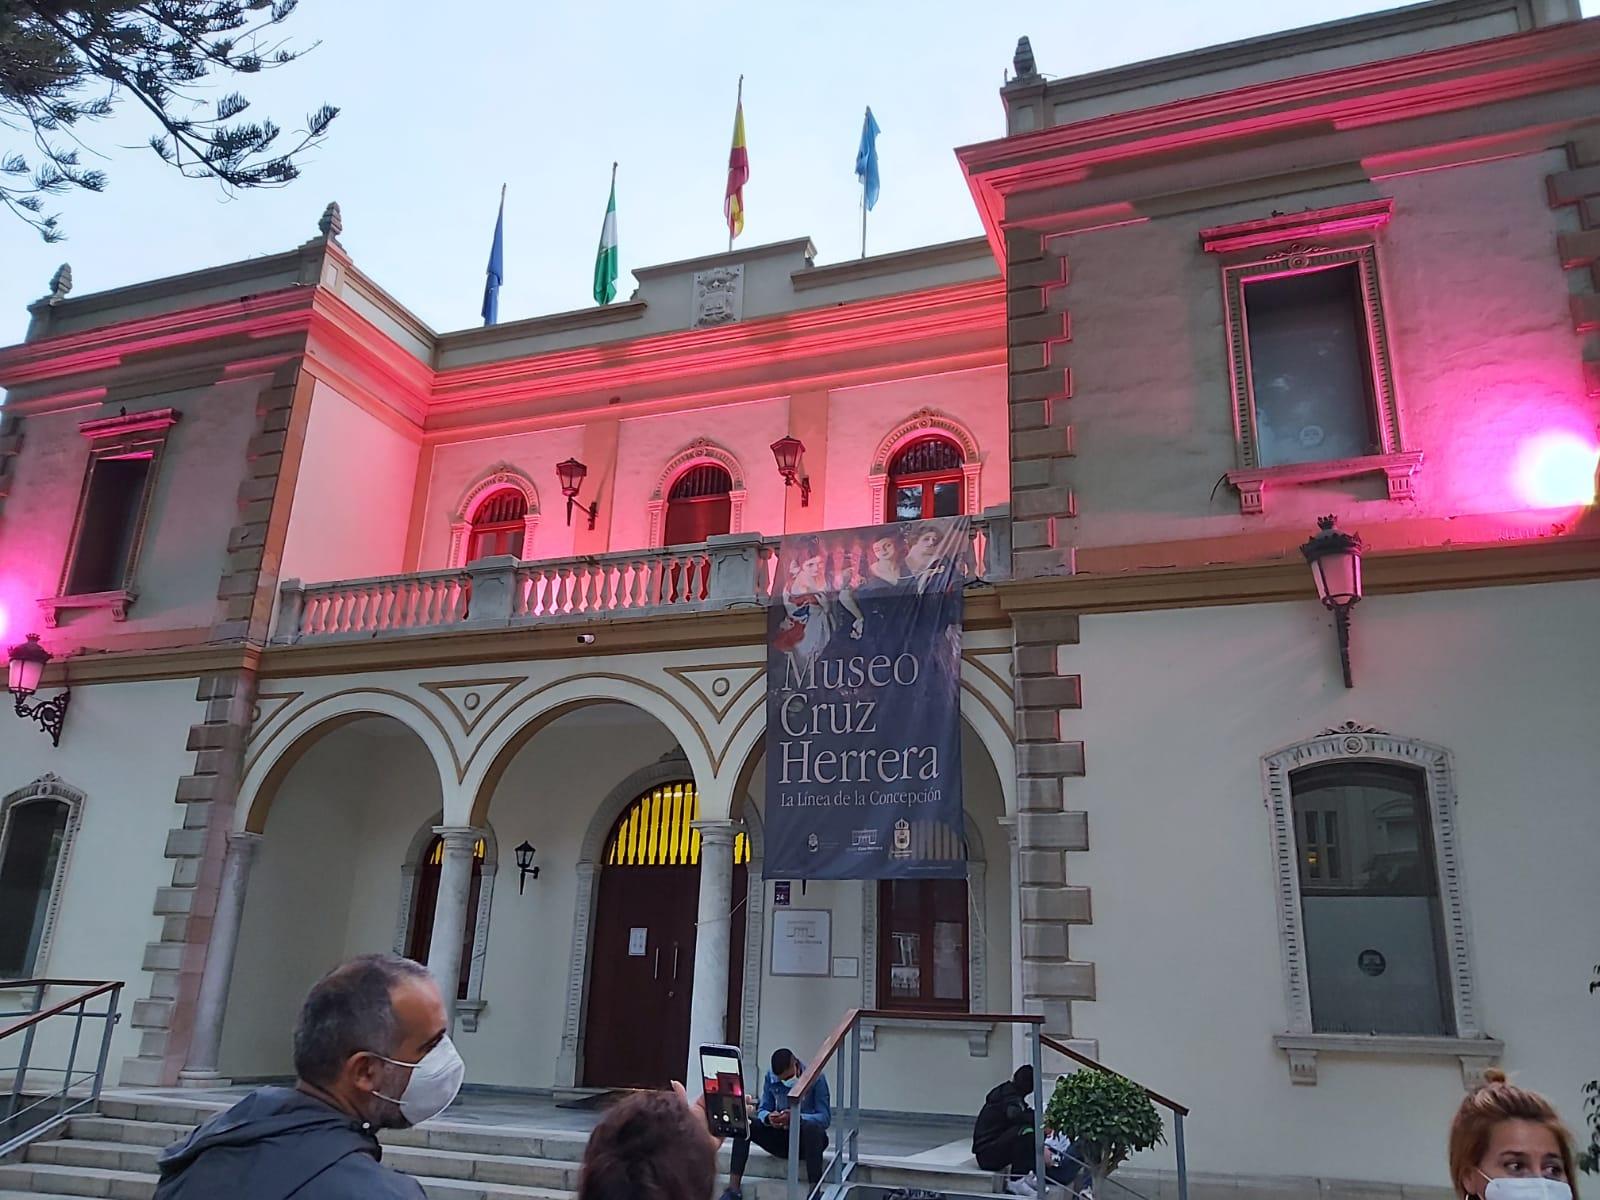 Iluminacion rosa cancer de mama museo Cruz Herrera